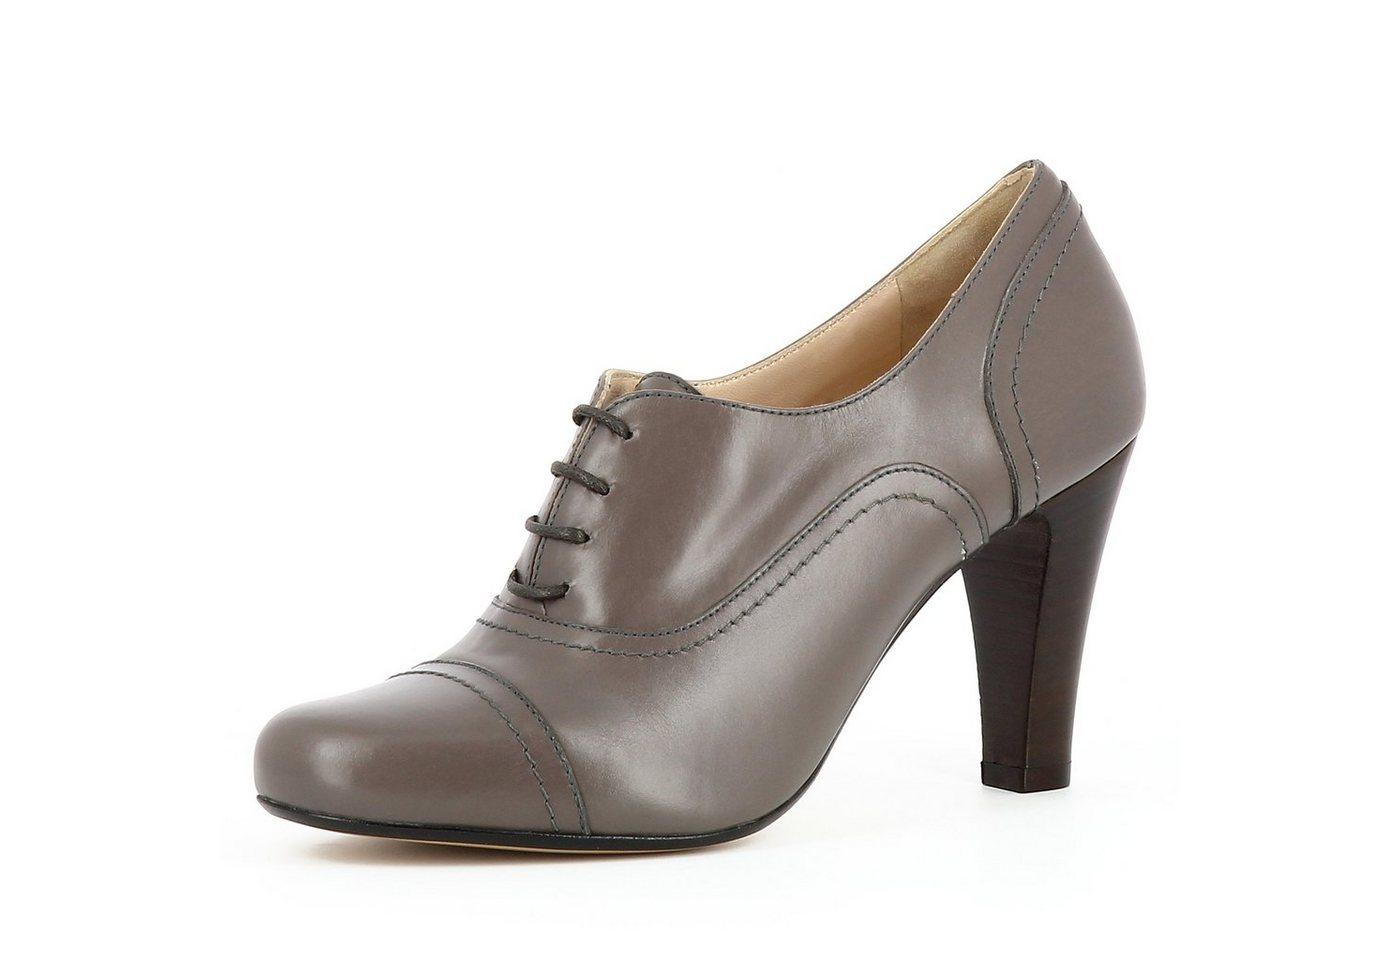 Evita »MARIA« Schnürpumps   Schuhe > Pumps > Schnürpumps   Braun   Evita